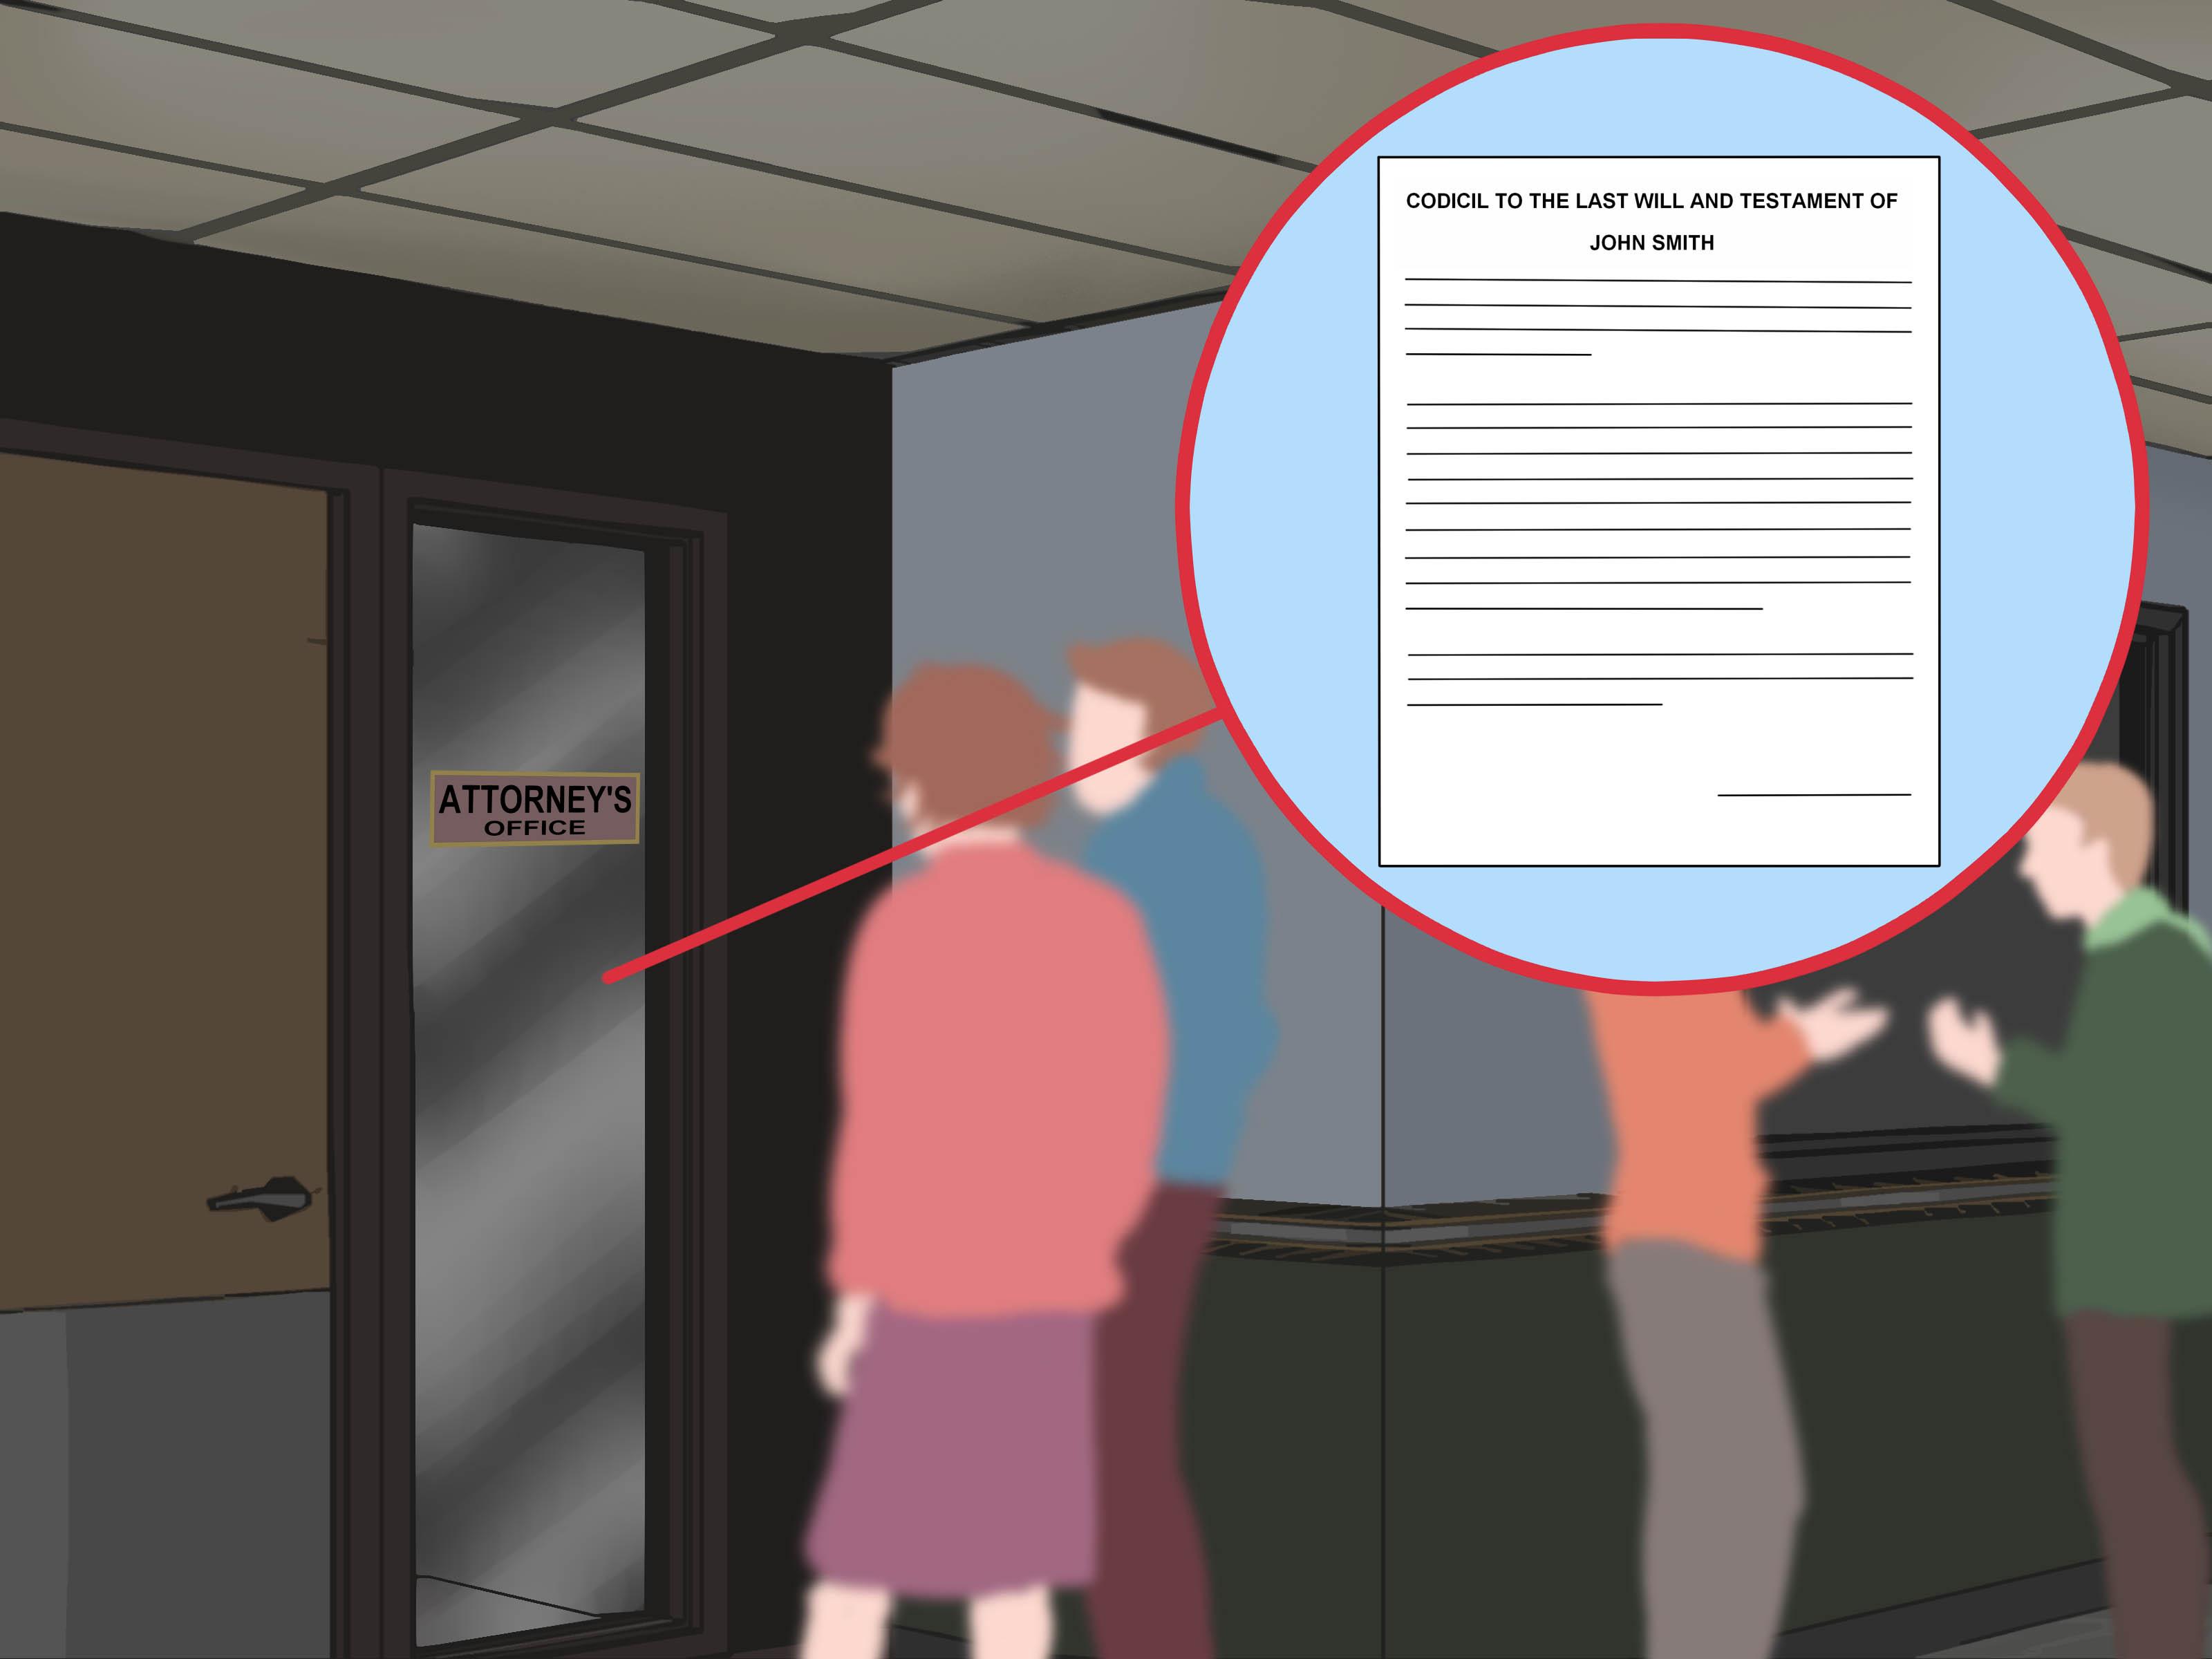 How To Write A Codicil (With Sample Codicil) - Wikihow - Free Printable Codicil Form